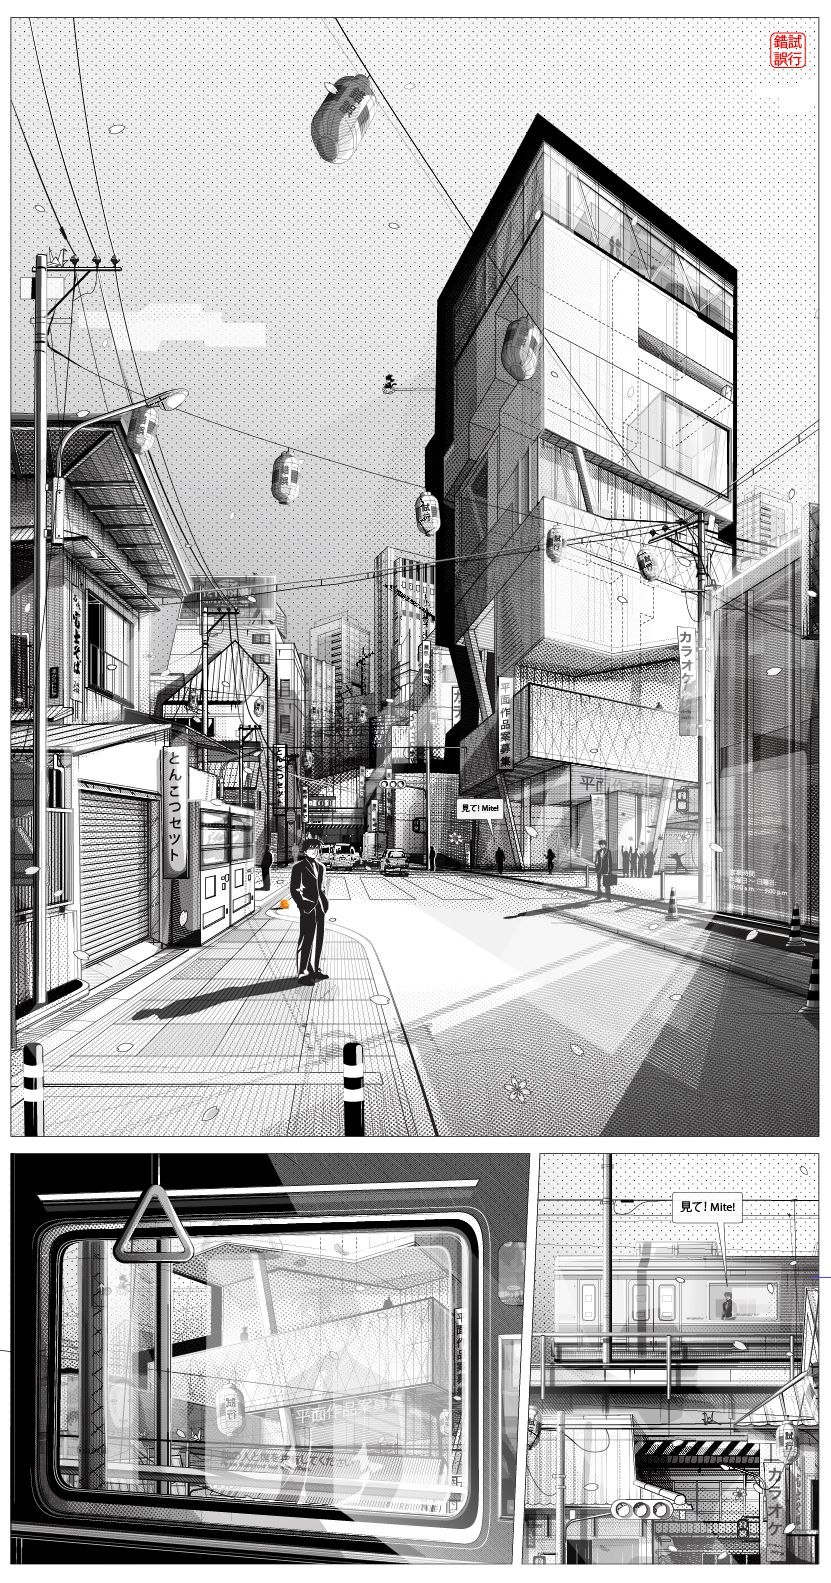 Alexander daxbock tokyo metropolis illustrations on - Architektur tokyo ...